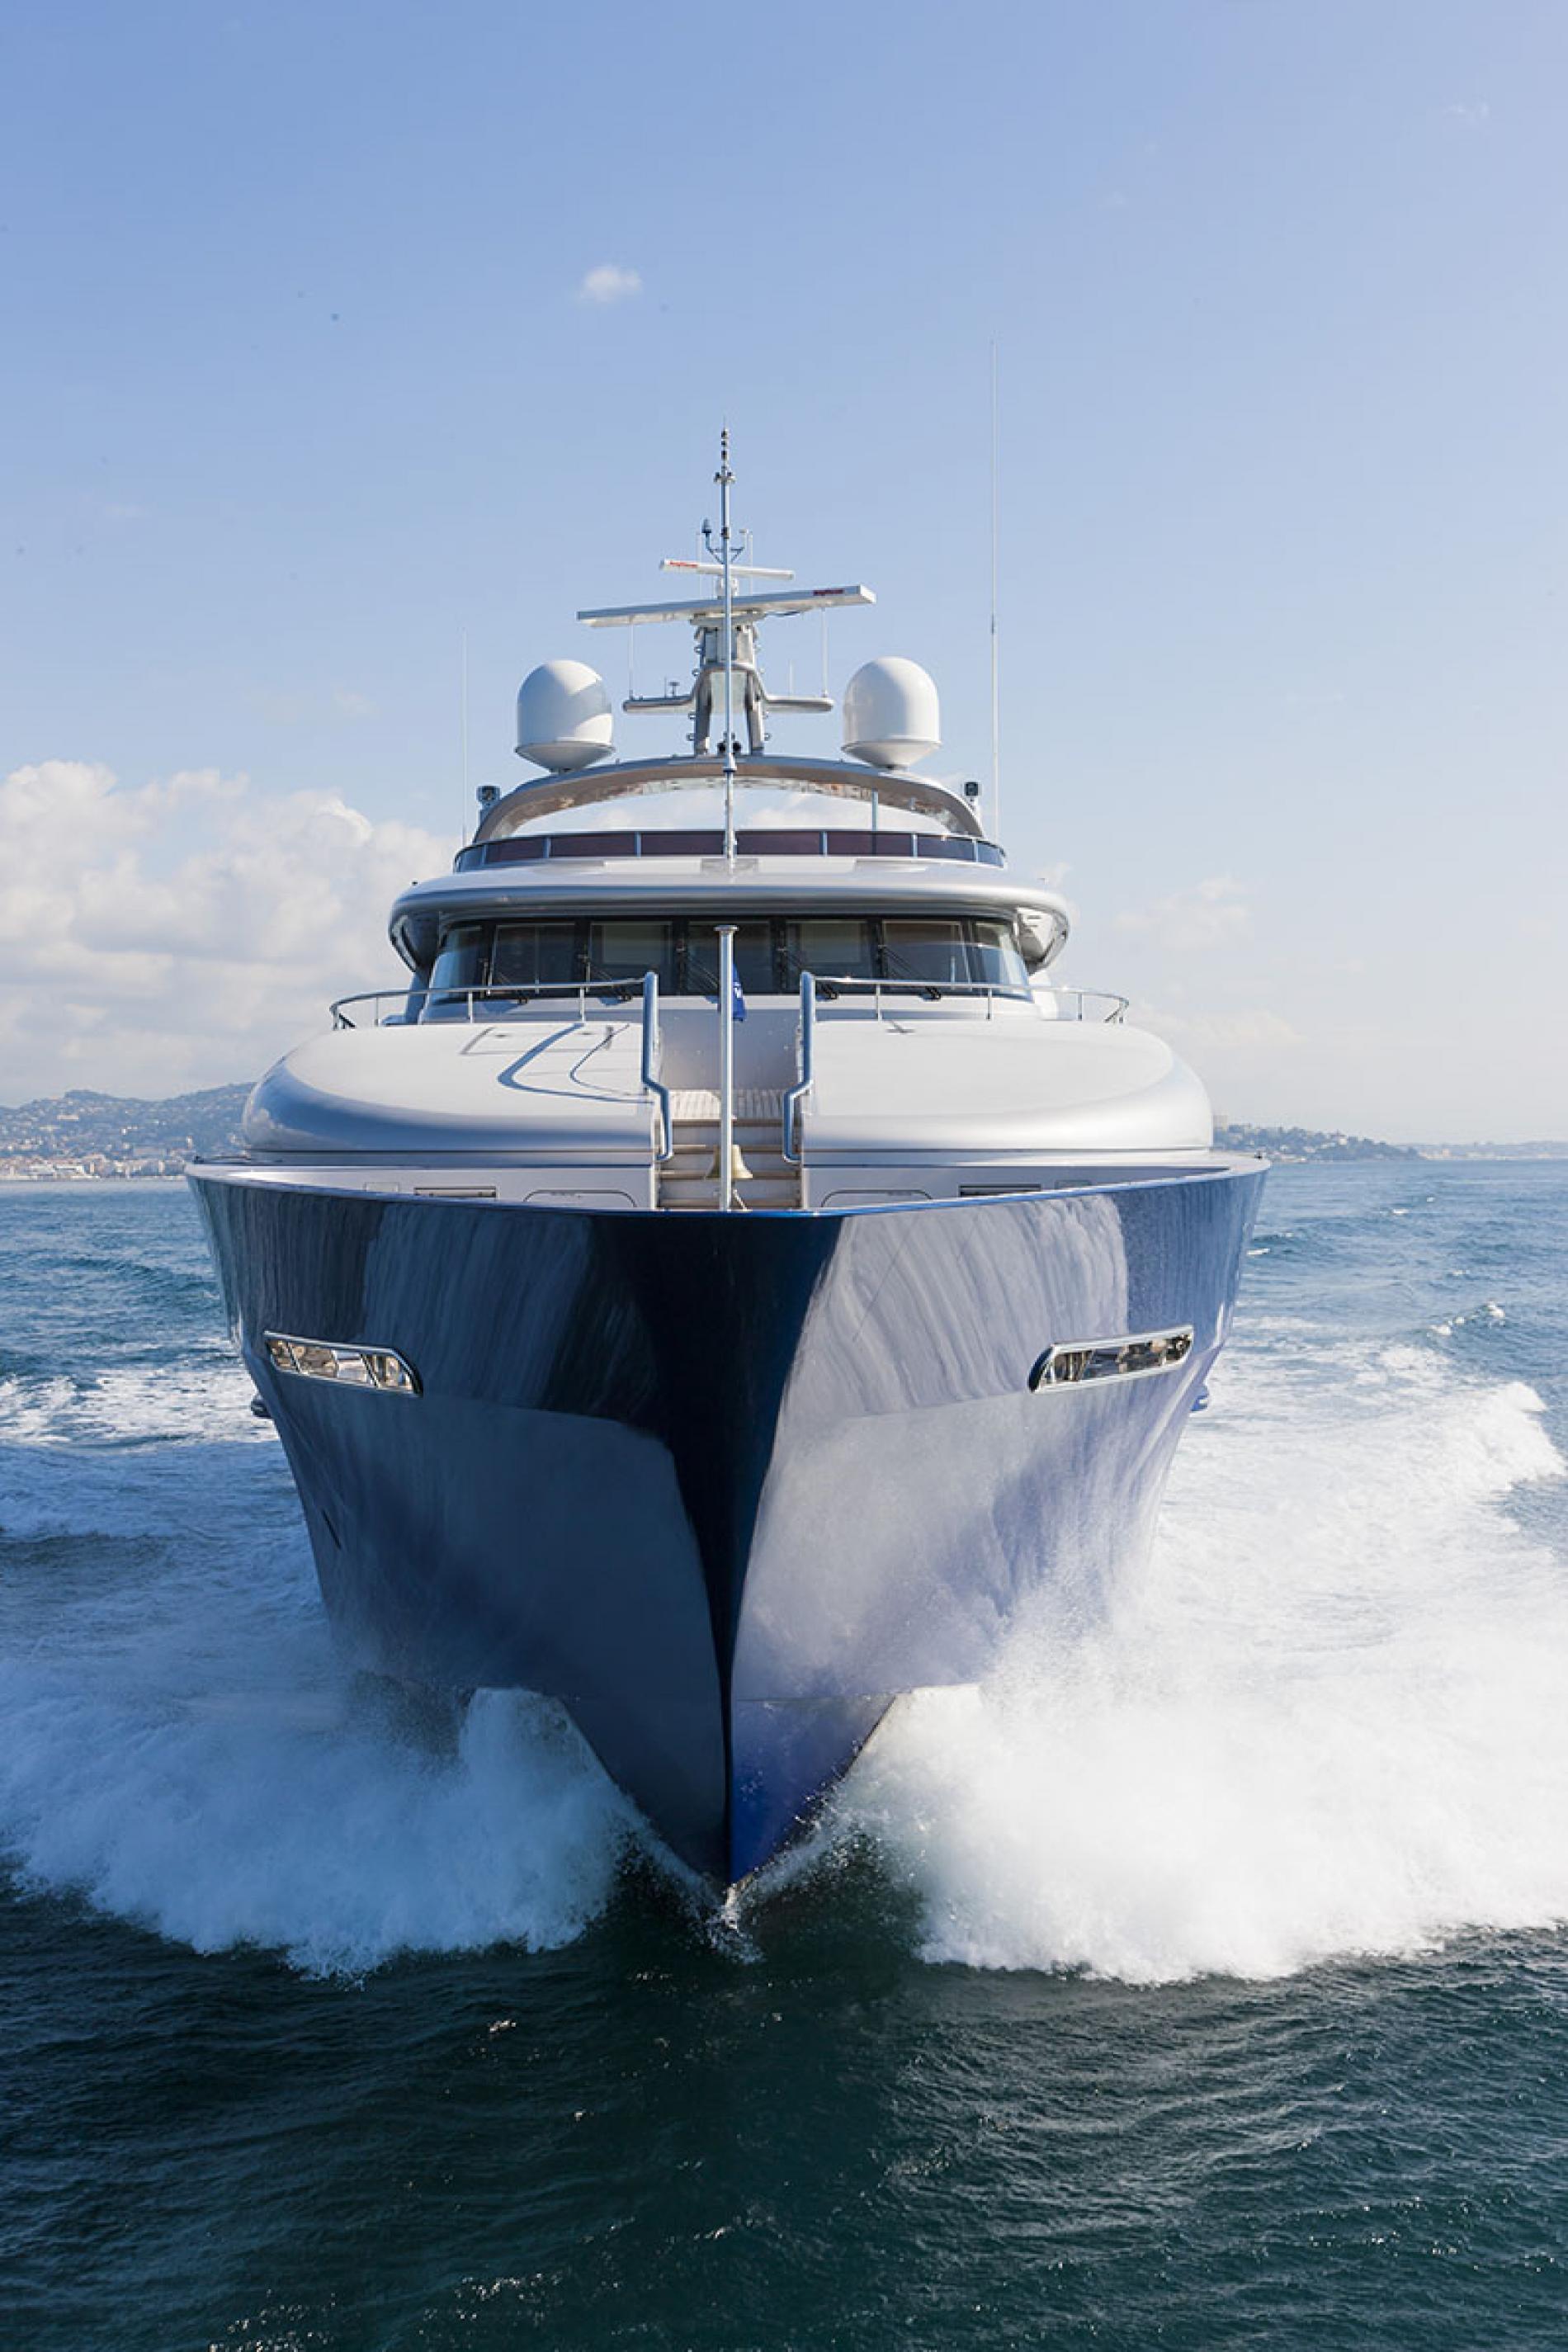 VULCAN 46M - Luxury Motor Yacht For Sale - Exterior Design - Img 1 | C&N